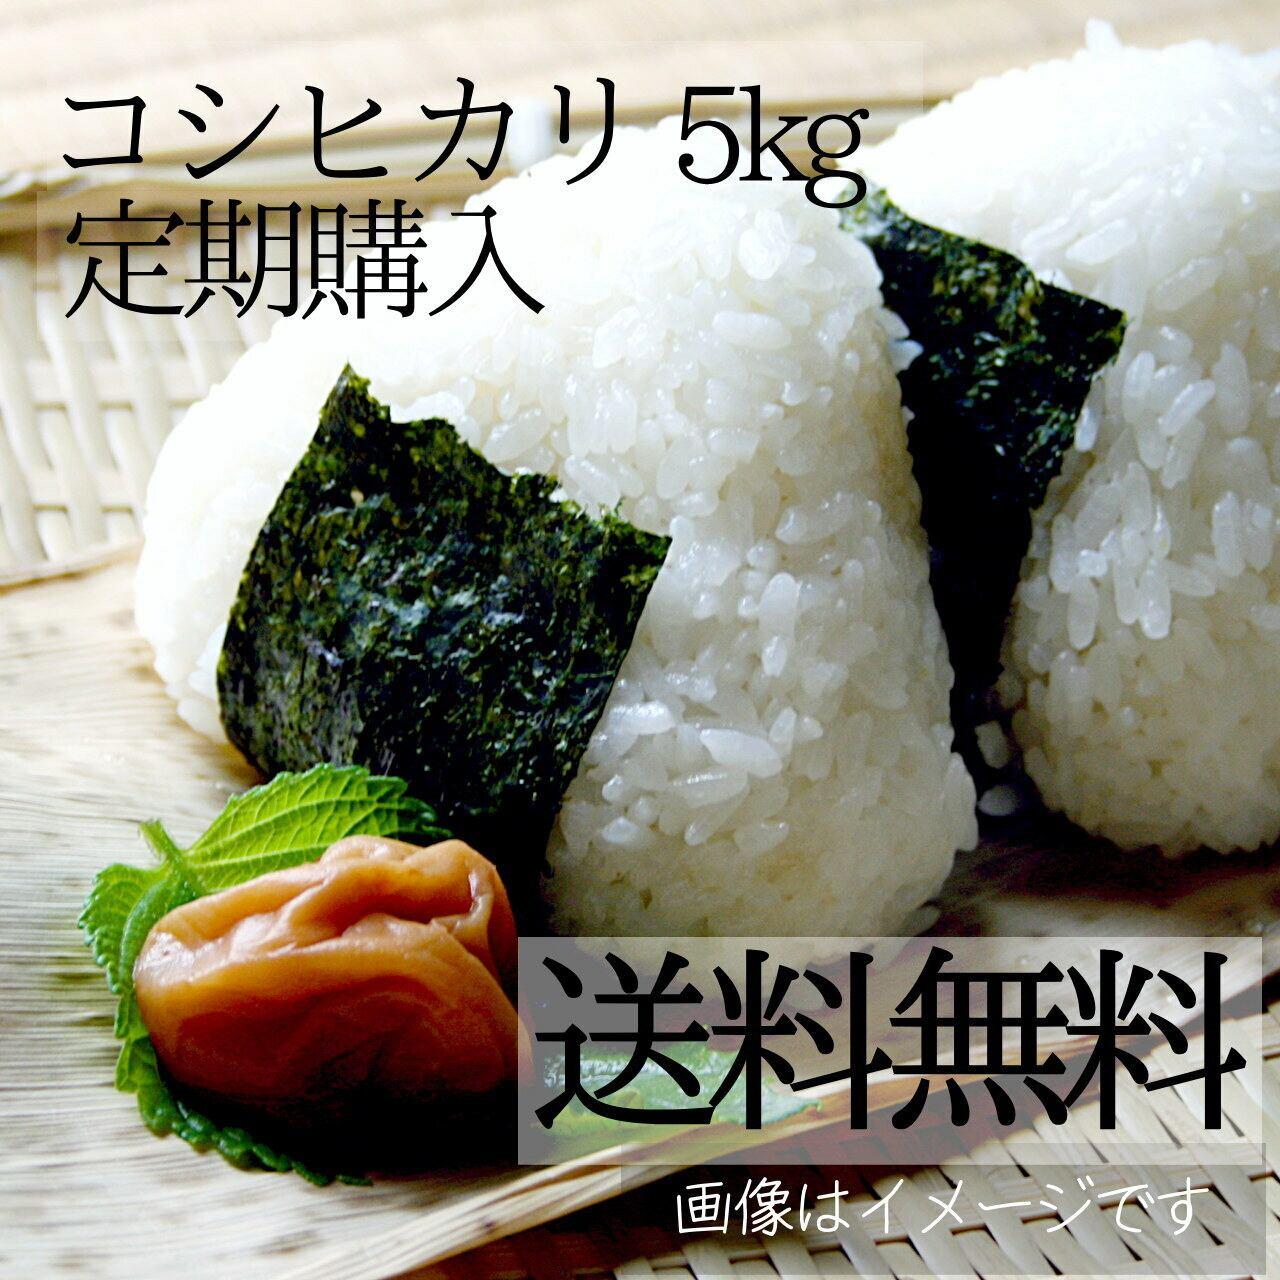 米 5kg(キロ) 新潟コシヒカリ【送料無料】【定期購入】 新潟米 精白米 阿賀野産 2021年 新米